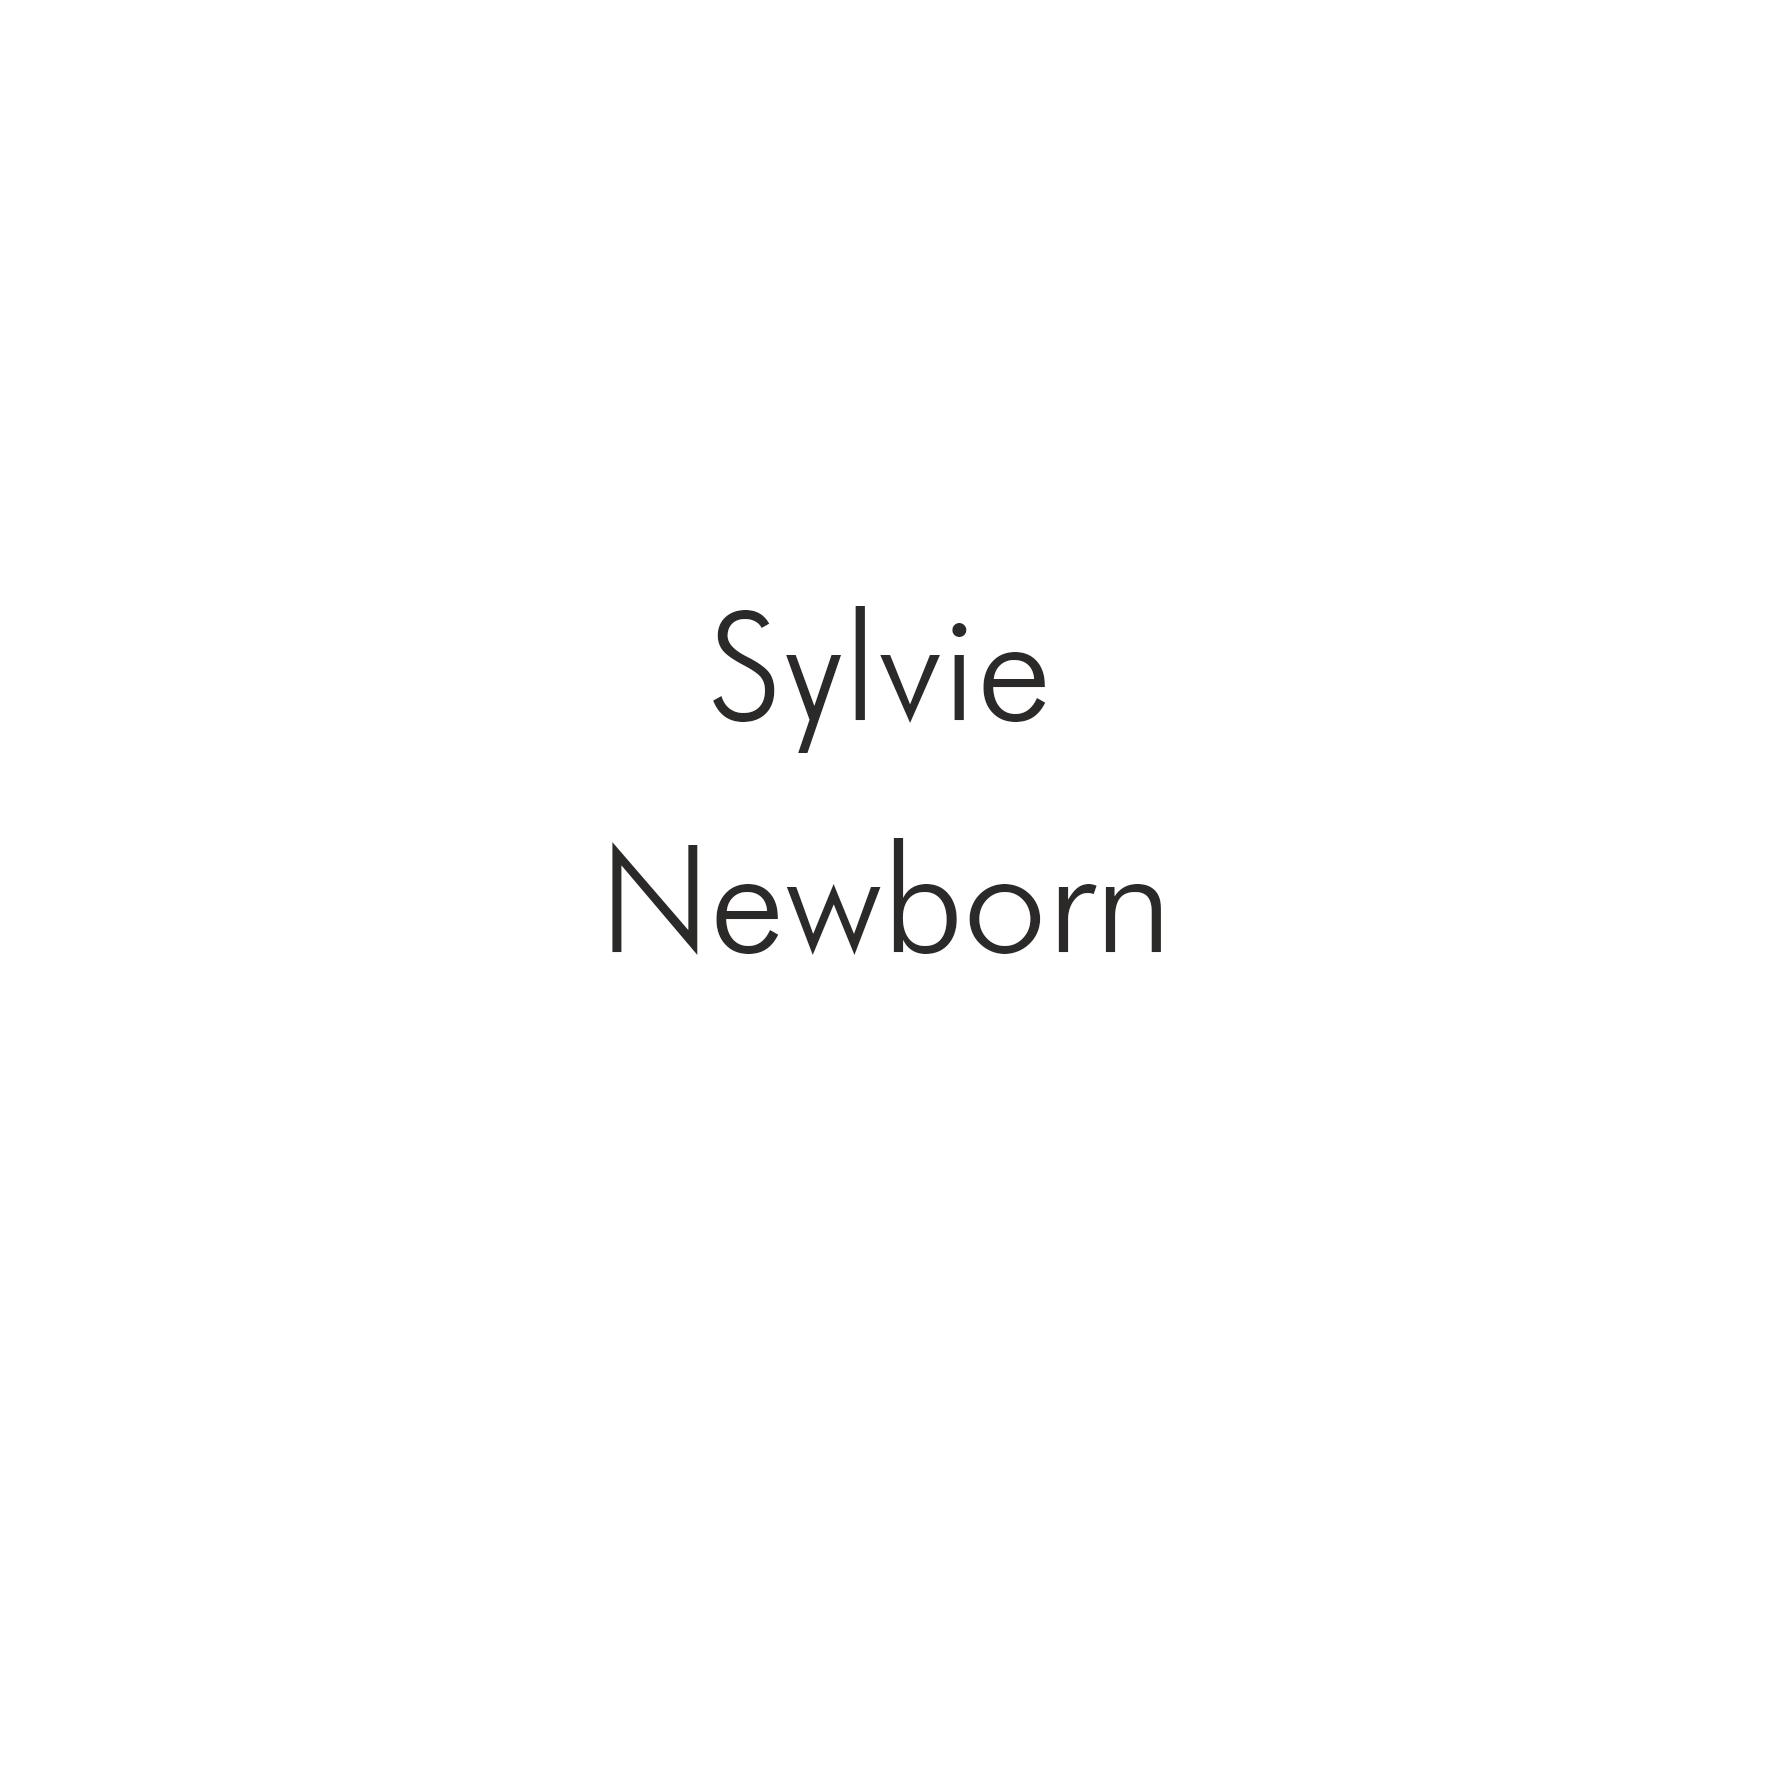 Sylvie Newborn.png